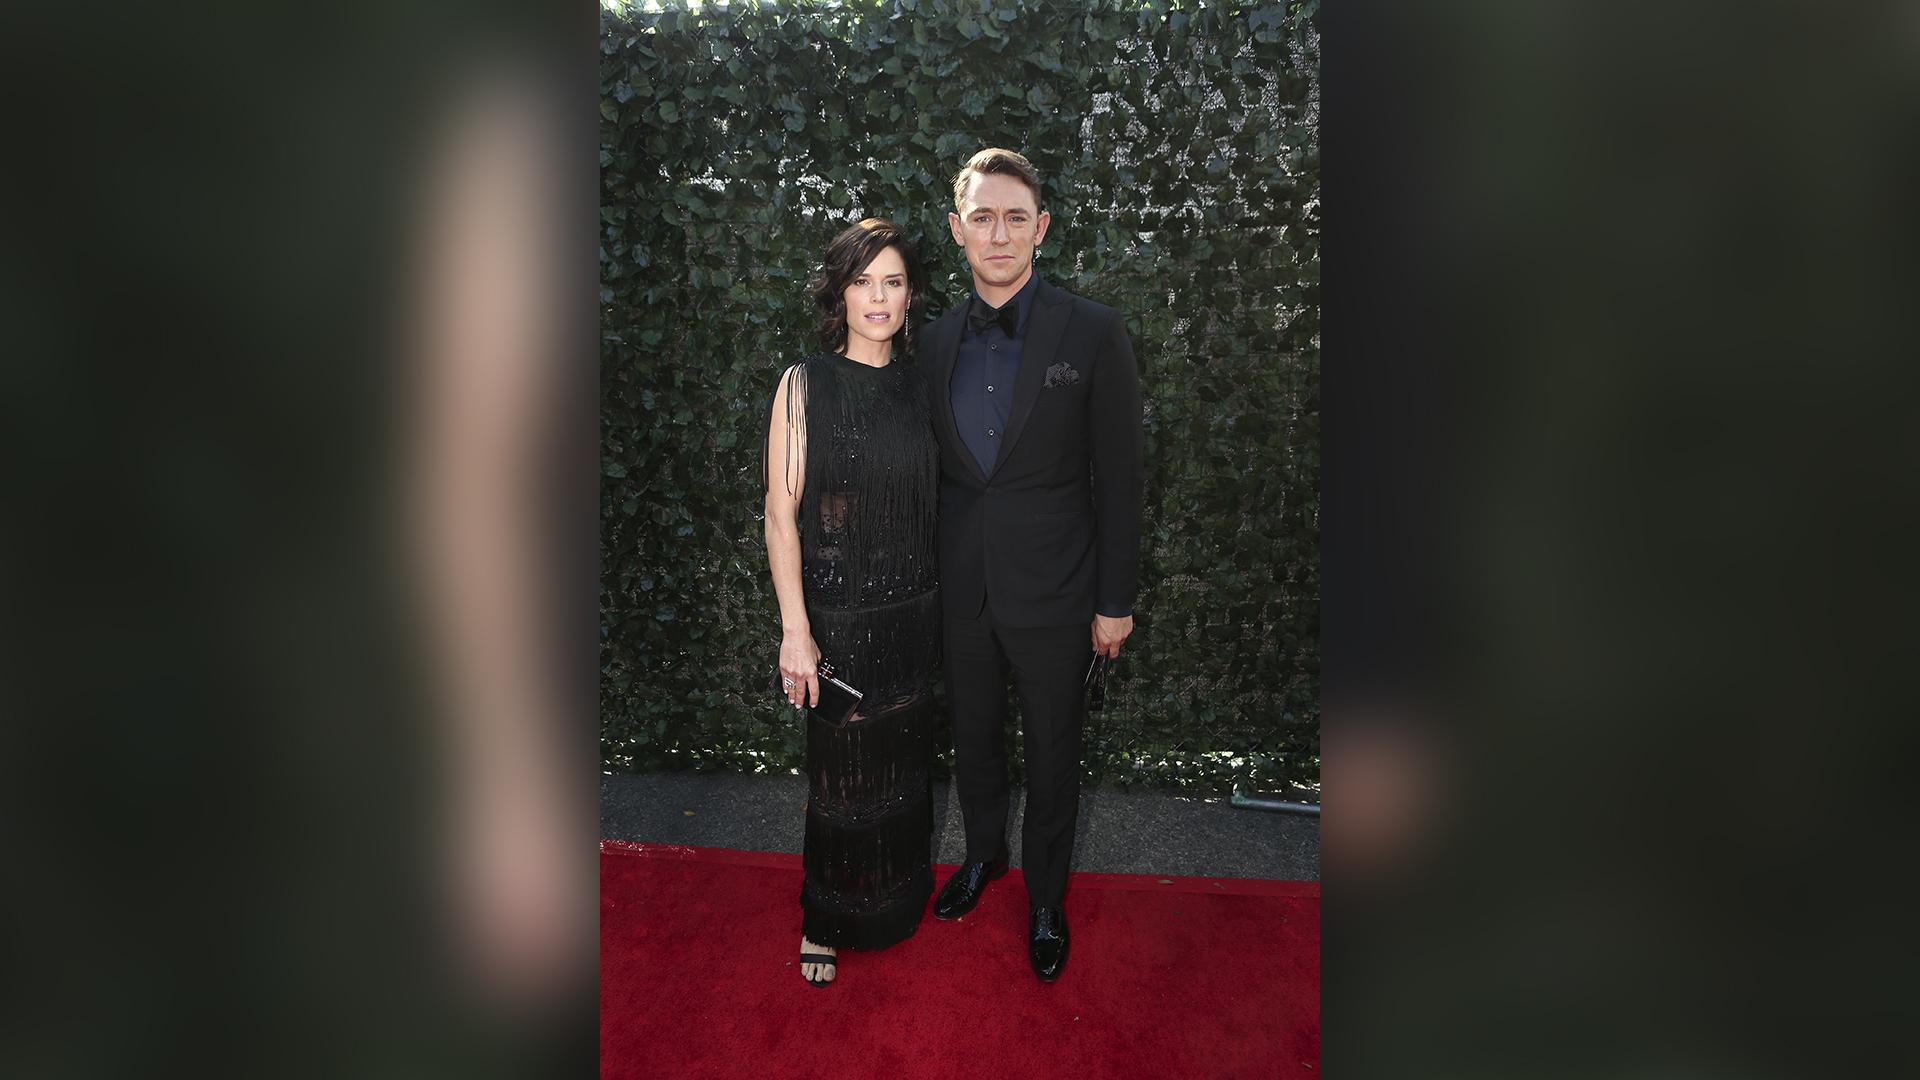 Neve Campbell and husband JJ Feild